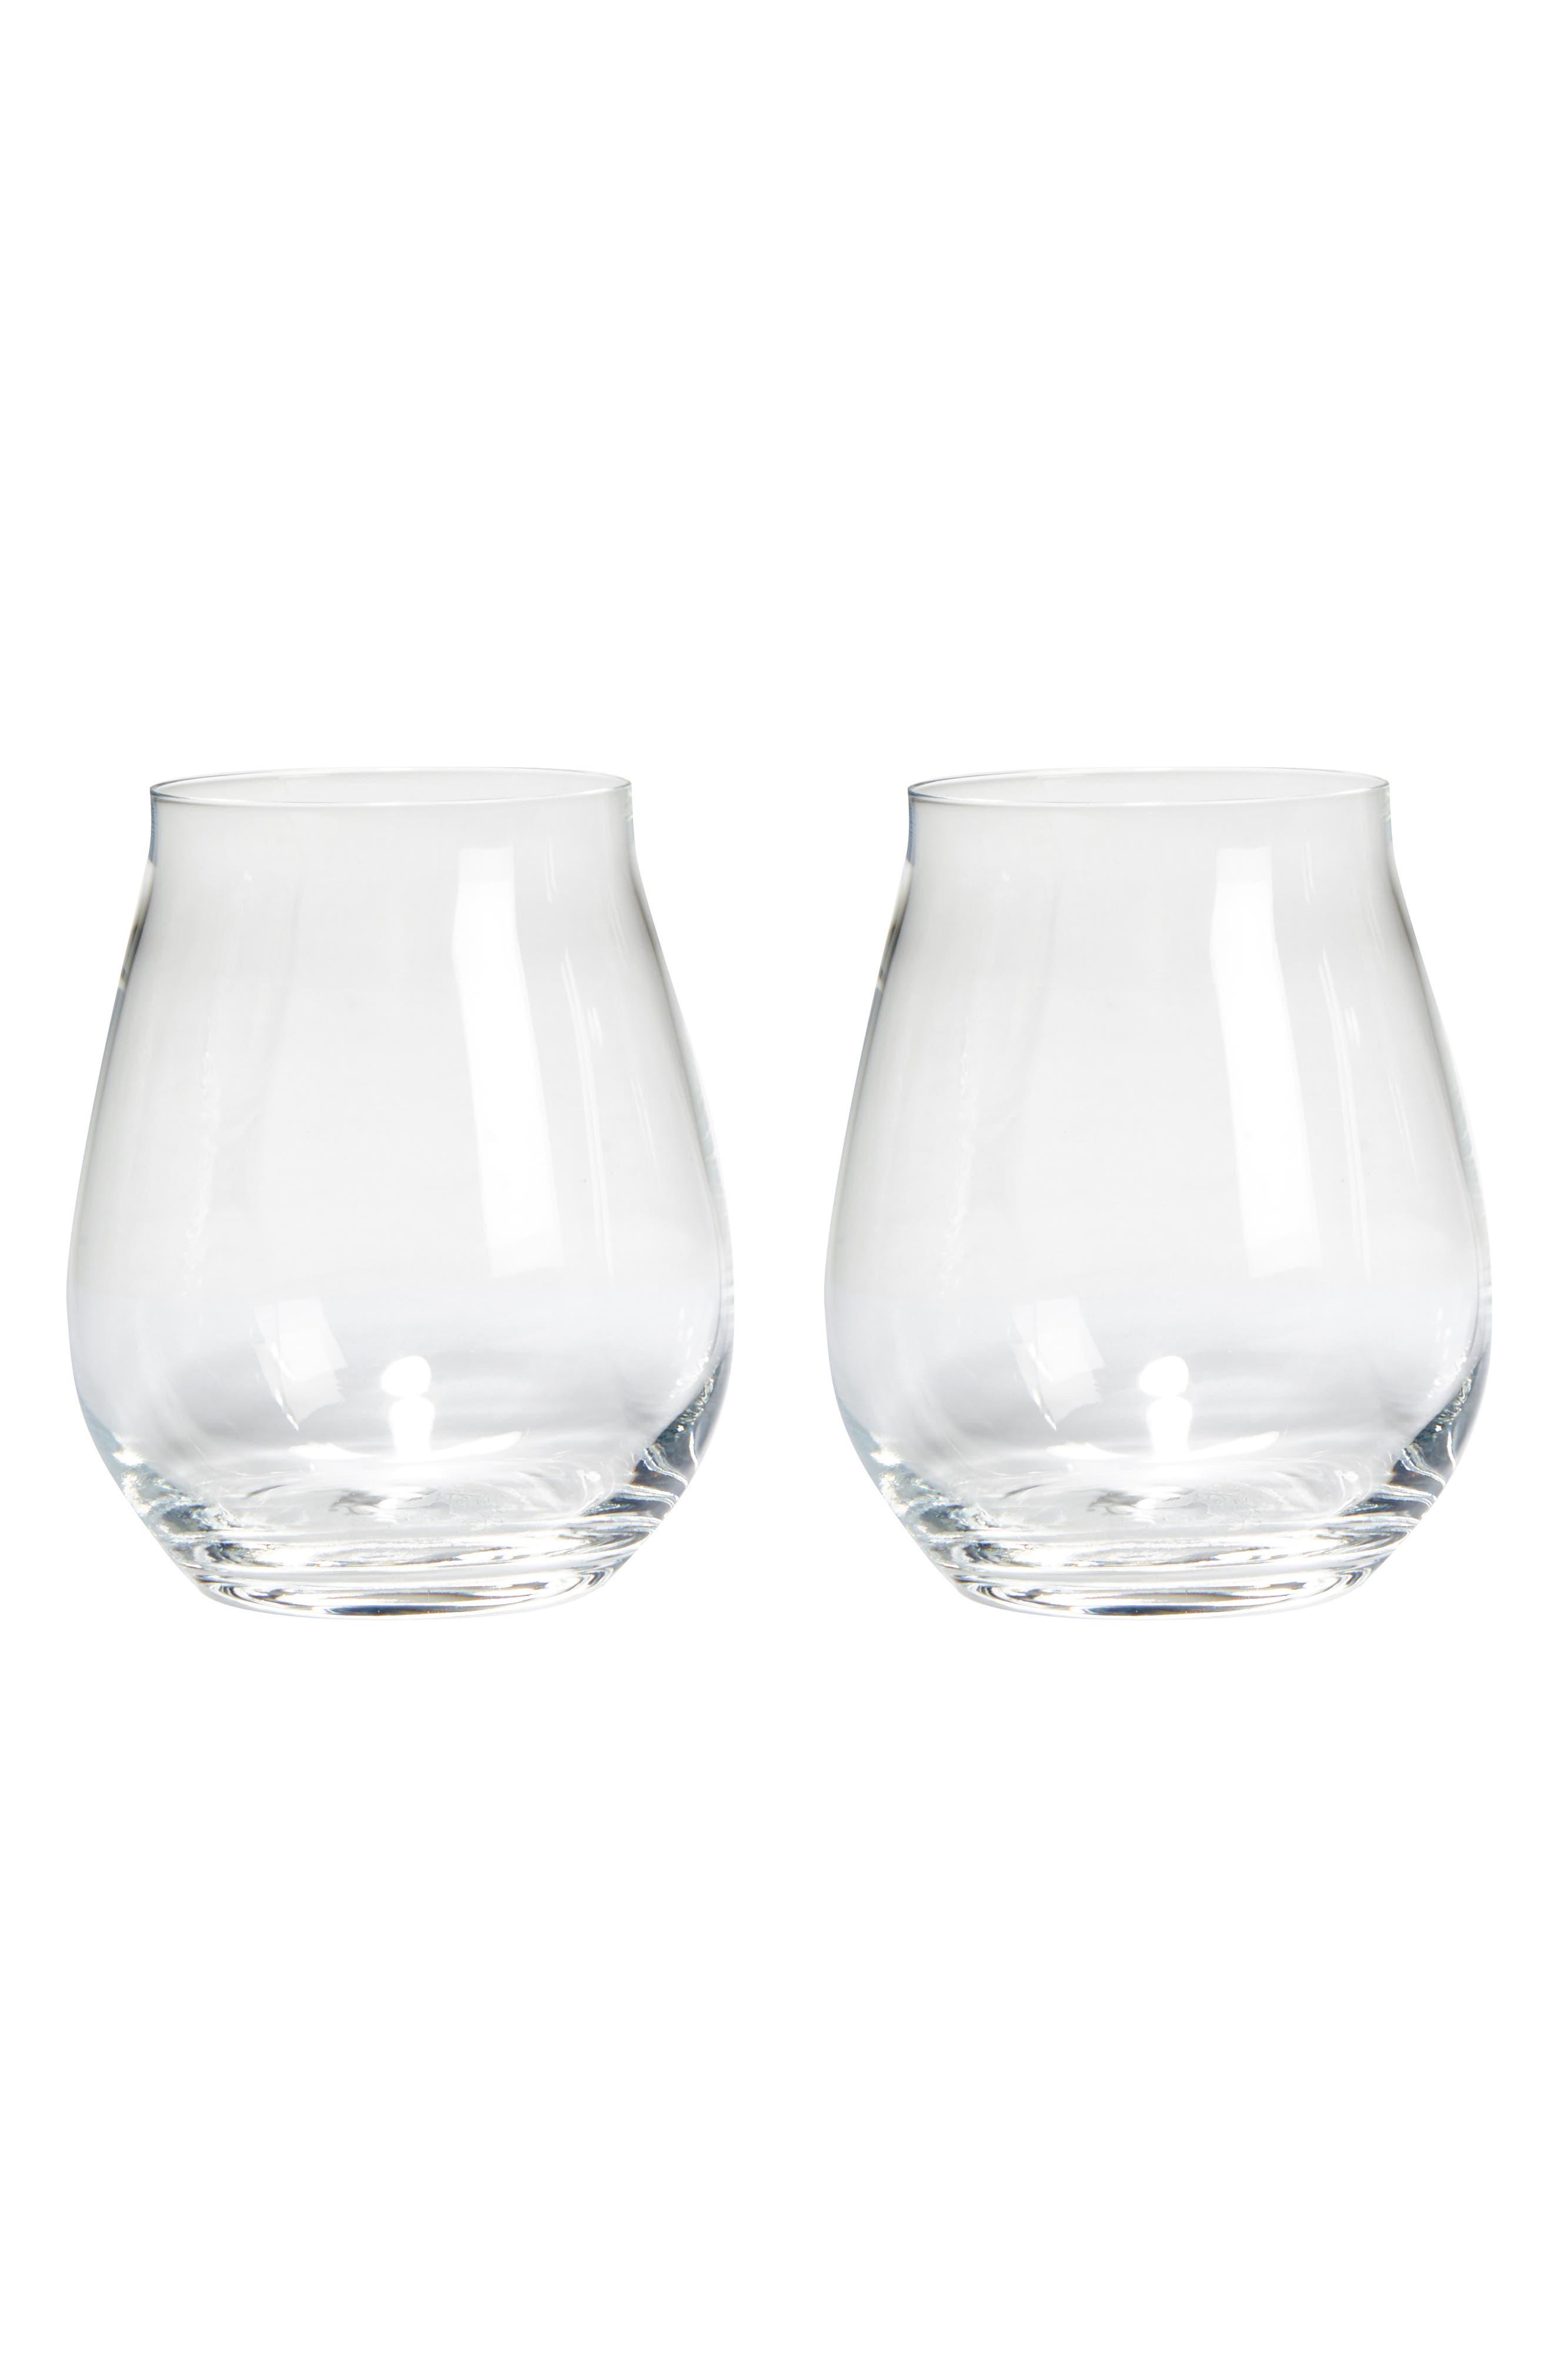 Luigi Bormiolo Vinea Trebbiano Set of 2 Stemless Wine Glasses,                             Main thumbnail 1, color,                             100